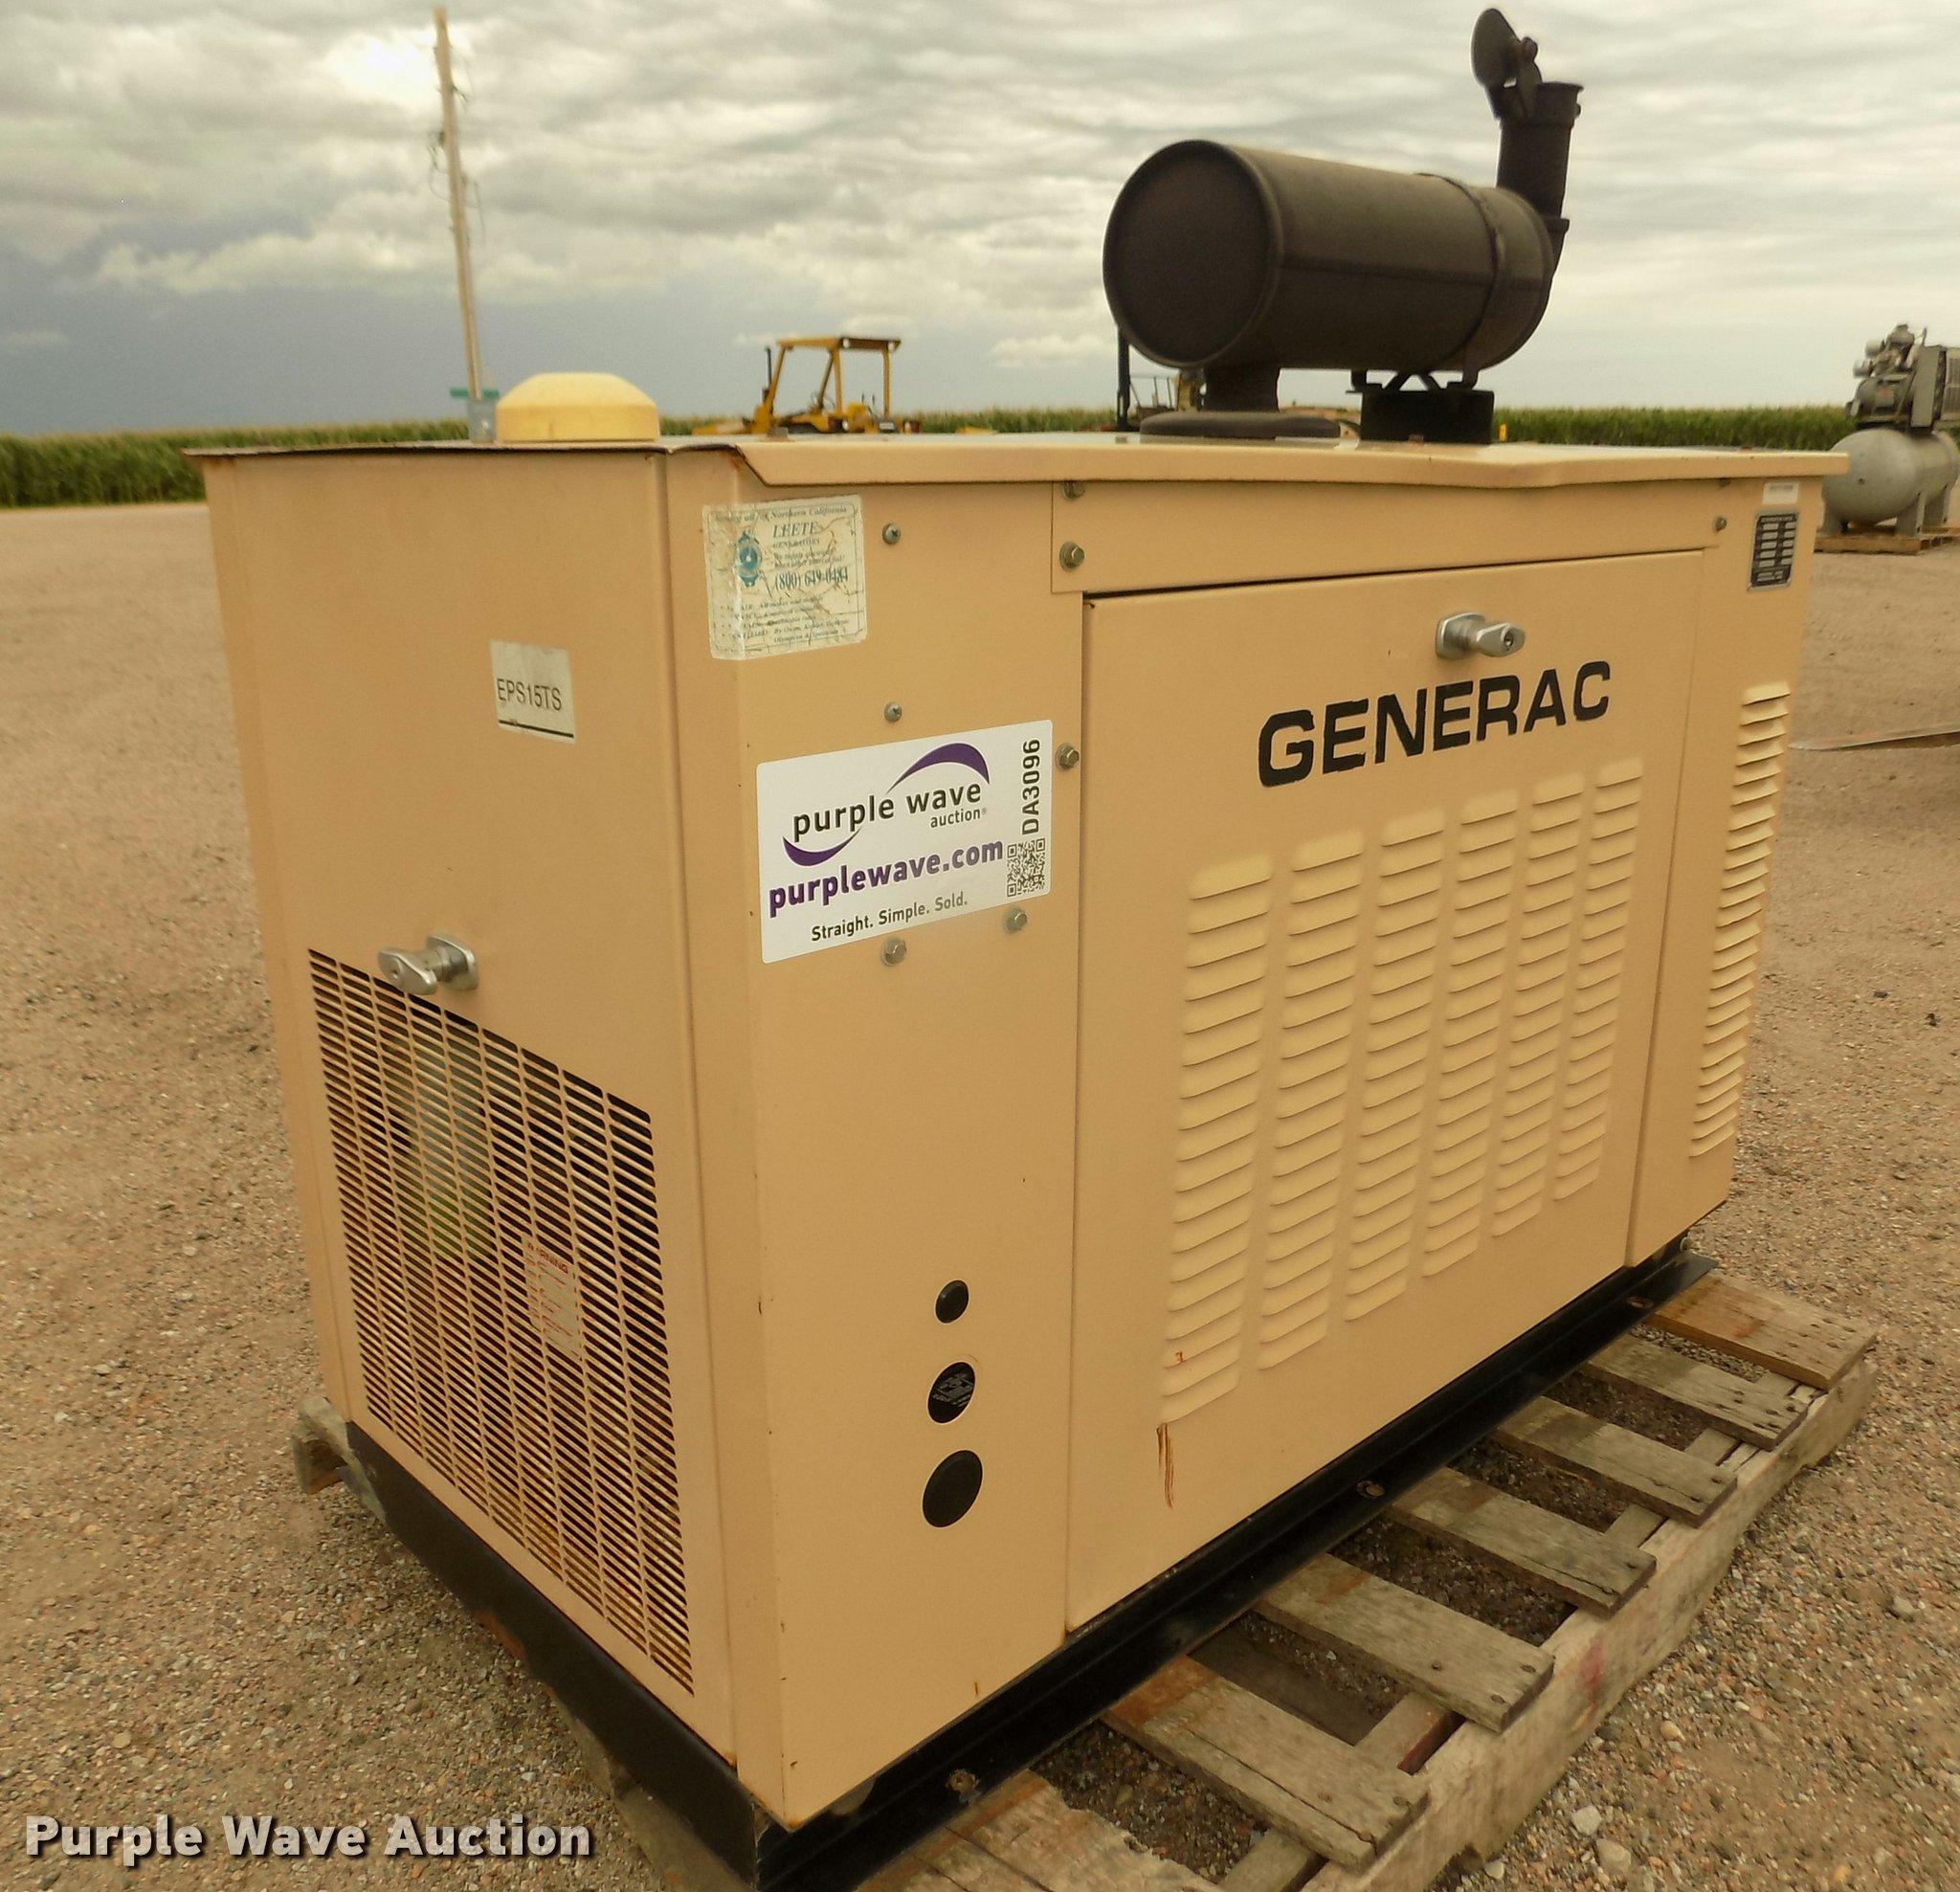 Generac 4 generator Item DA3096